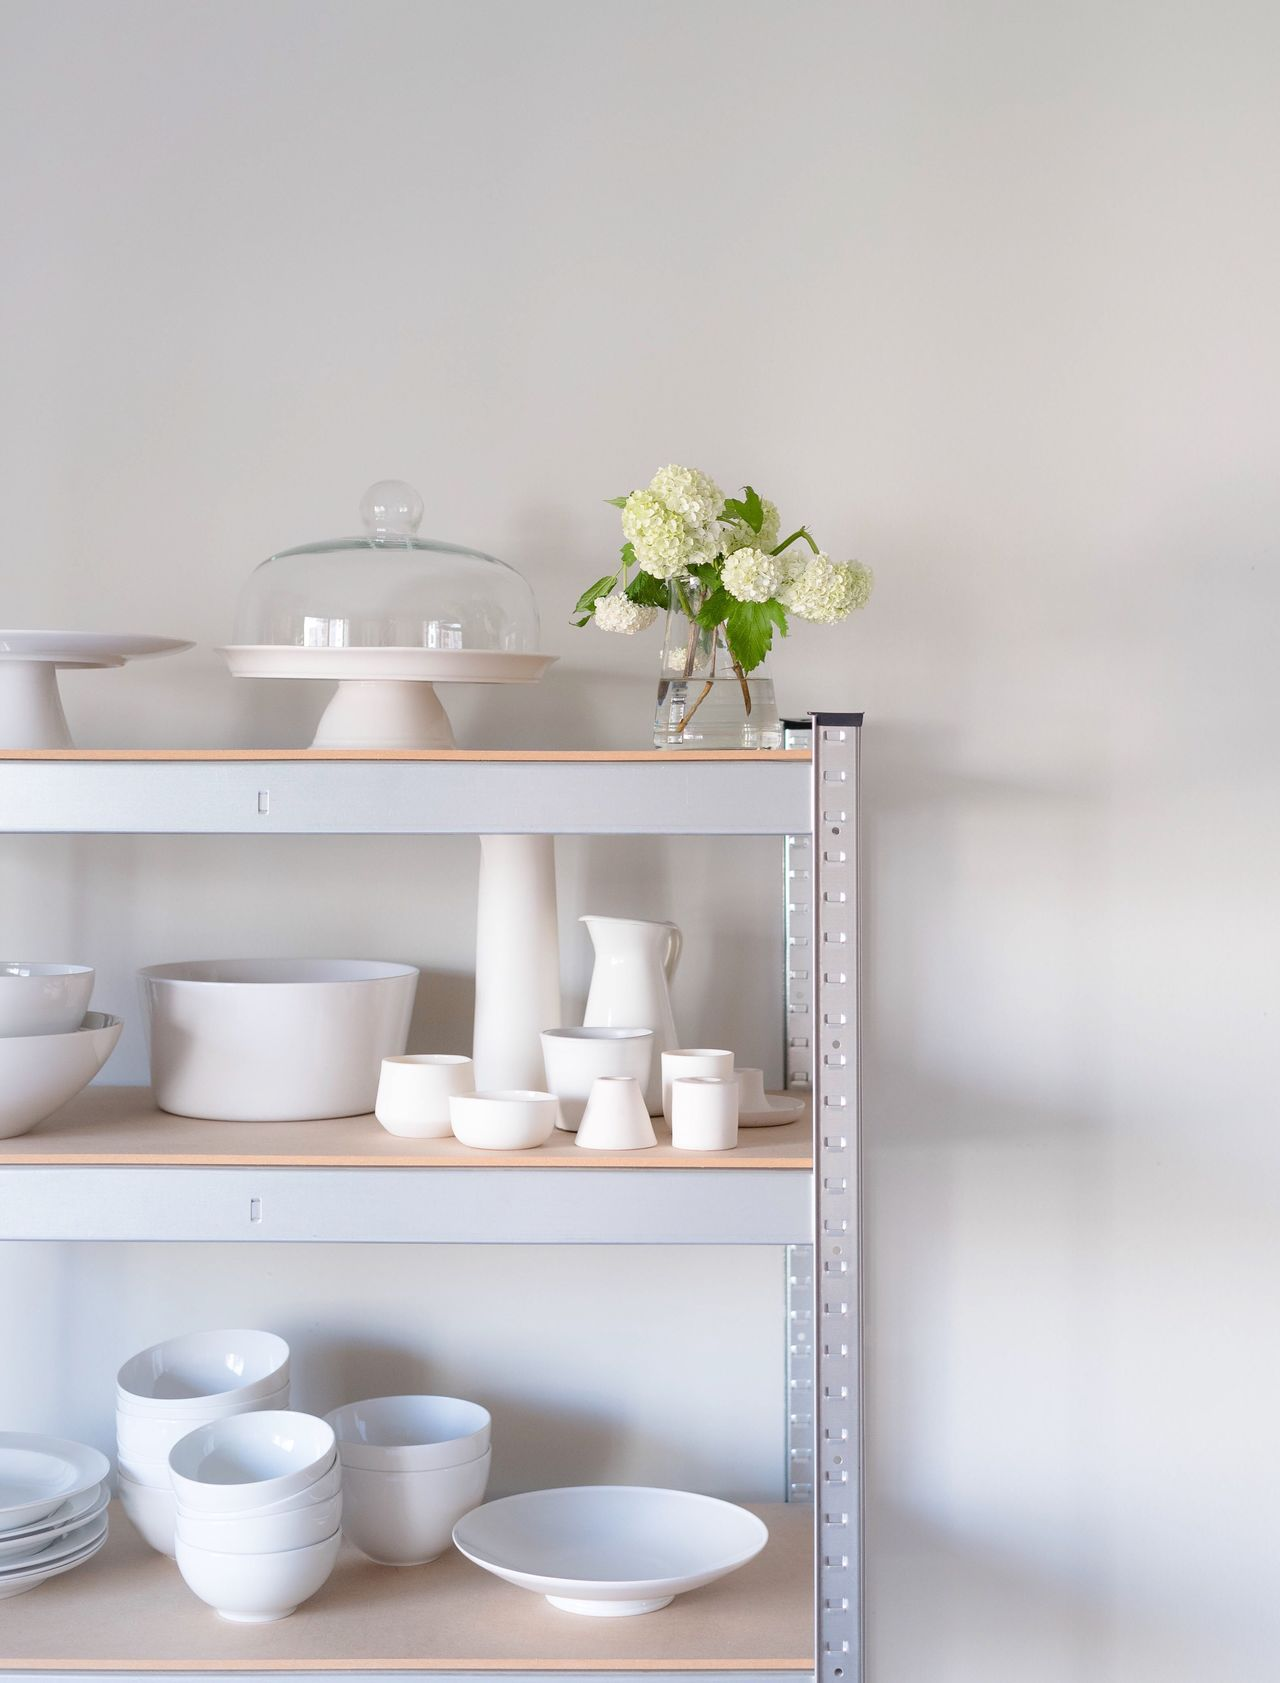 White Whites White Color Porcelain  Ceramics Dishes Vase Flower Shelf Kitchen Kitchen Utensils Variation Group Of Objects Close-up Indoors  Studio Kitchen Life Kitchenware Kitchen Stories Kitchen Shelves Freshness Bright Light White Background Studio Shot